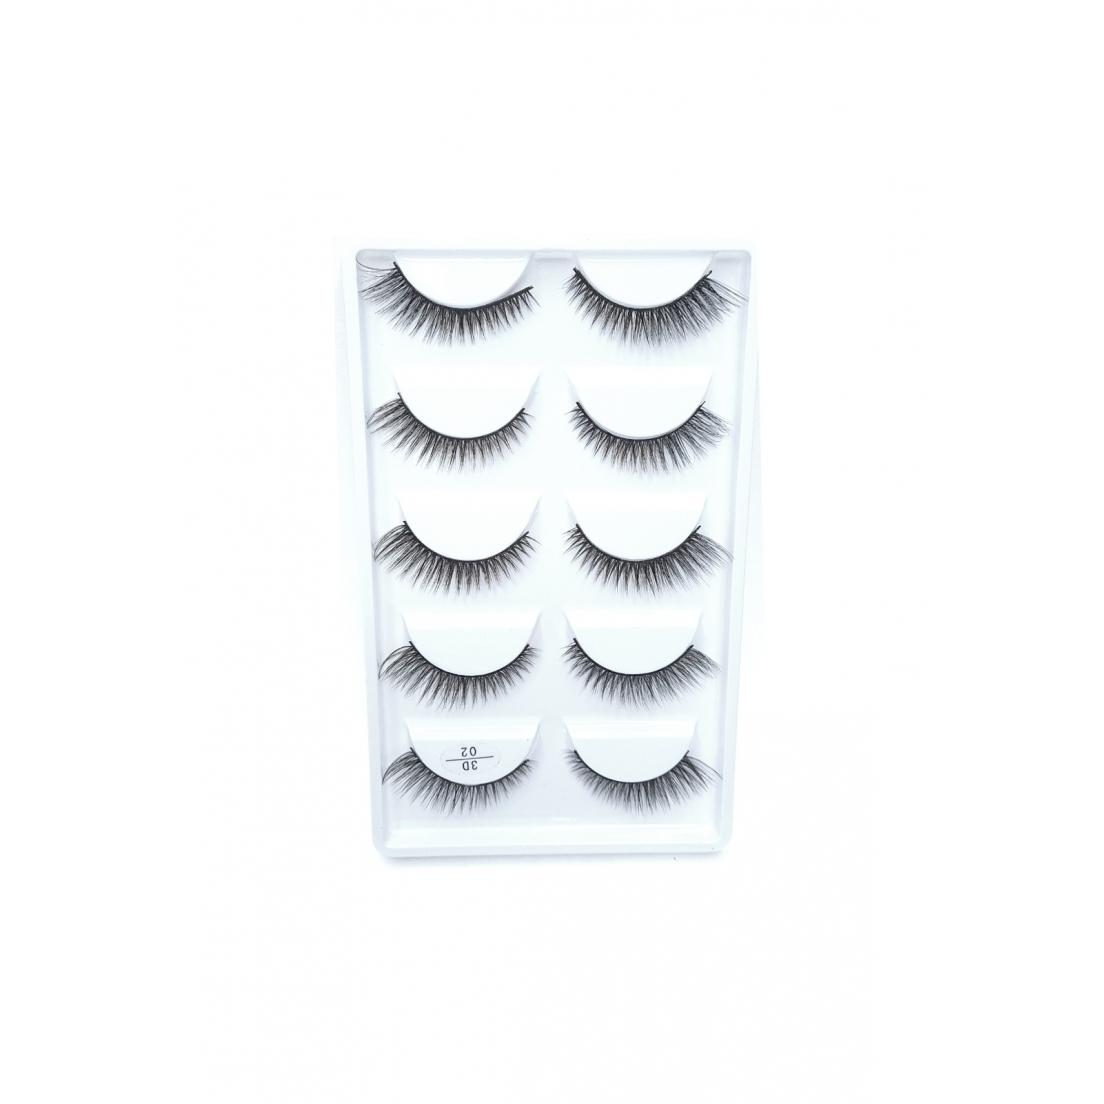 Cílios postiços 5 pares Adriane Makeup 3D n 02